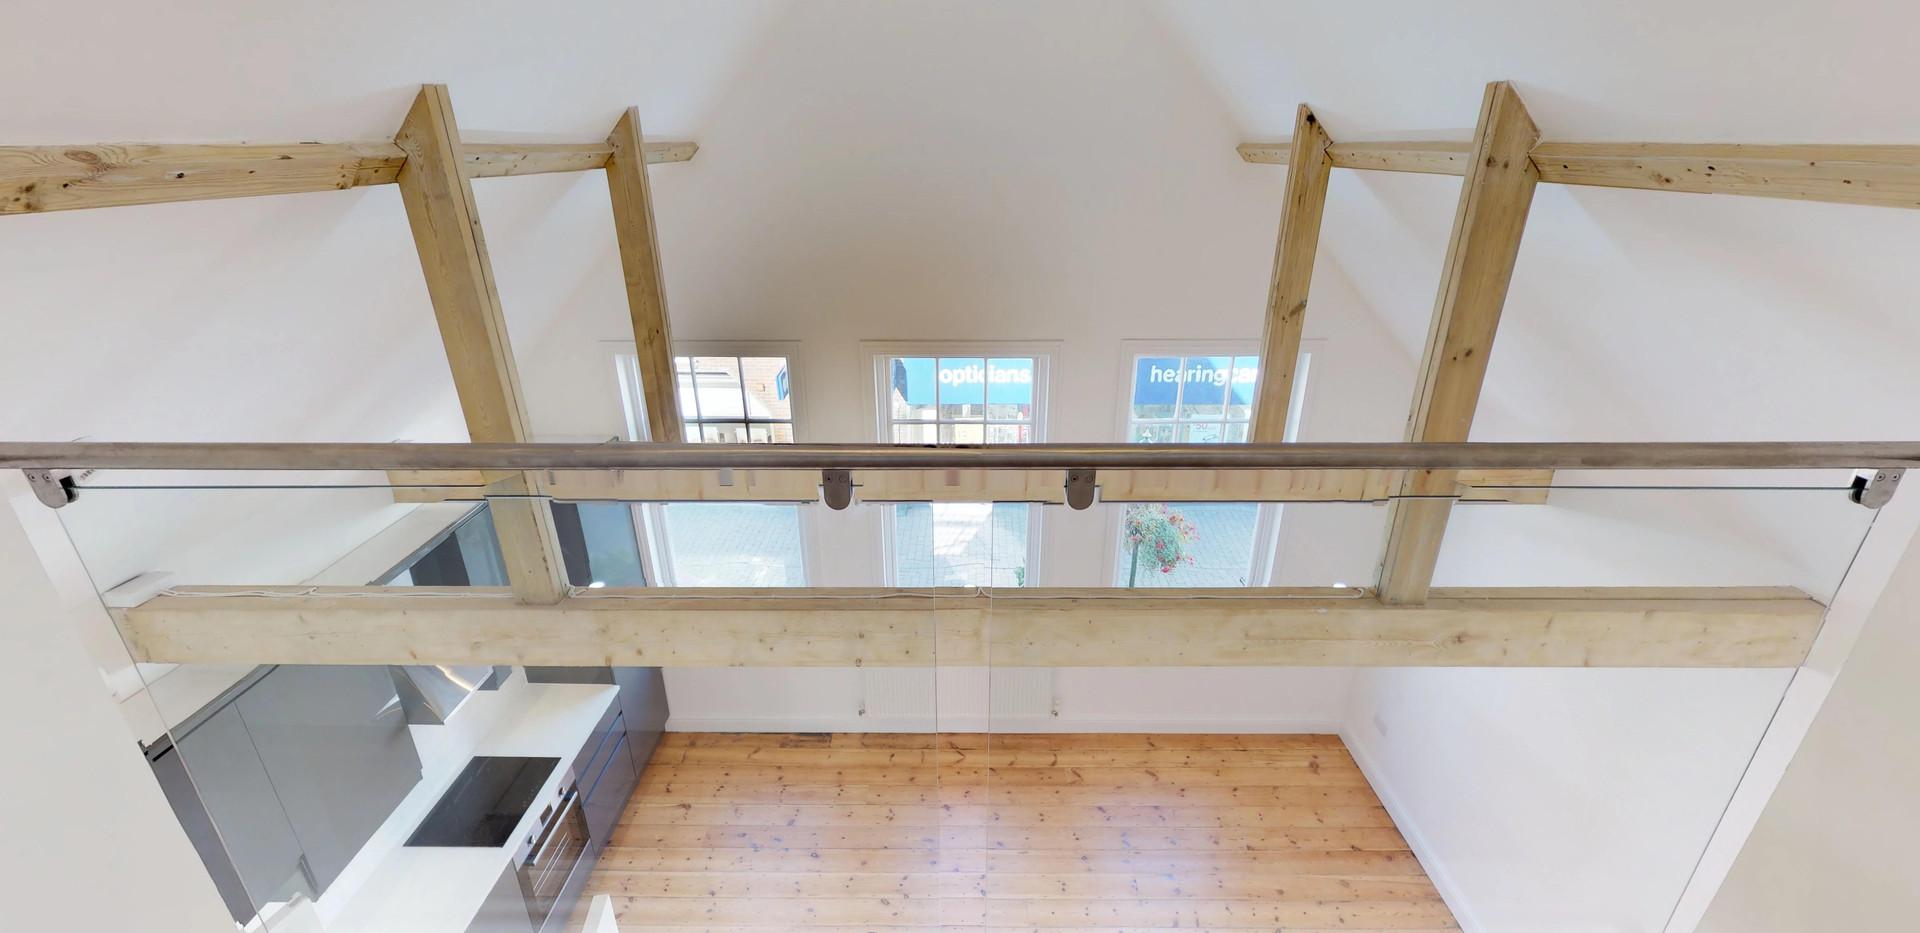 West-Street-Horsham-Flat-3-Bedroom-1.jpg